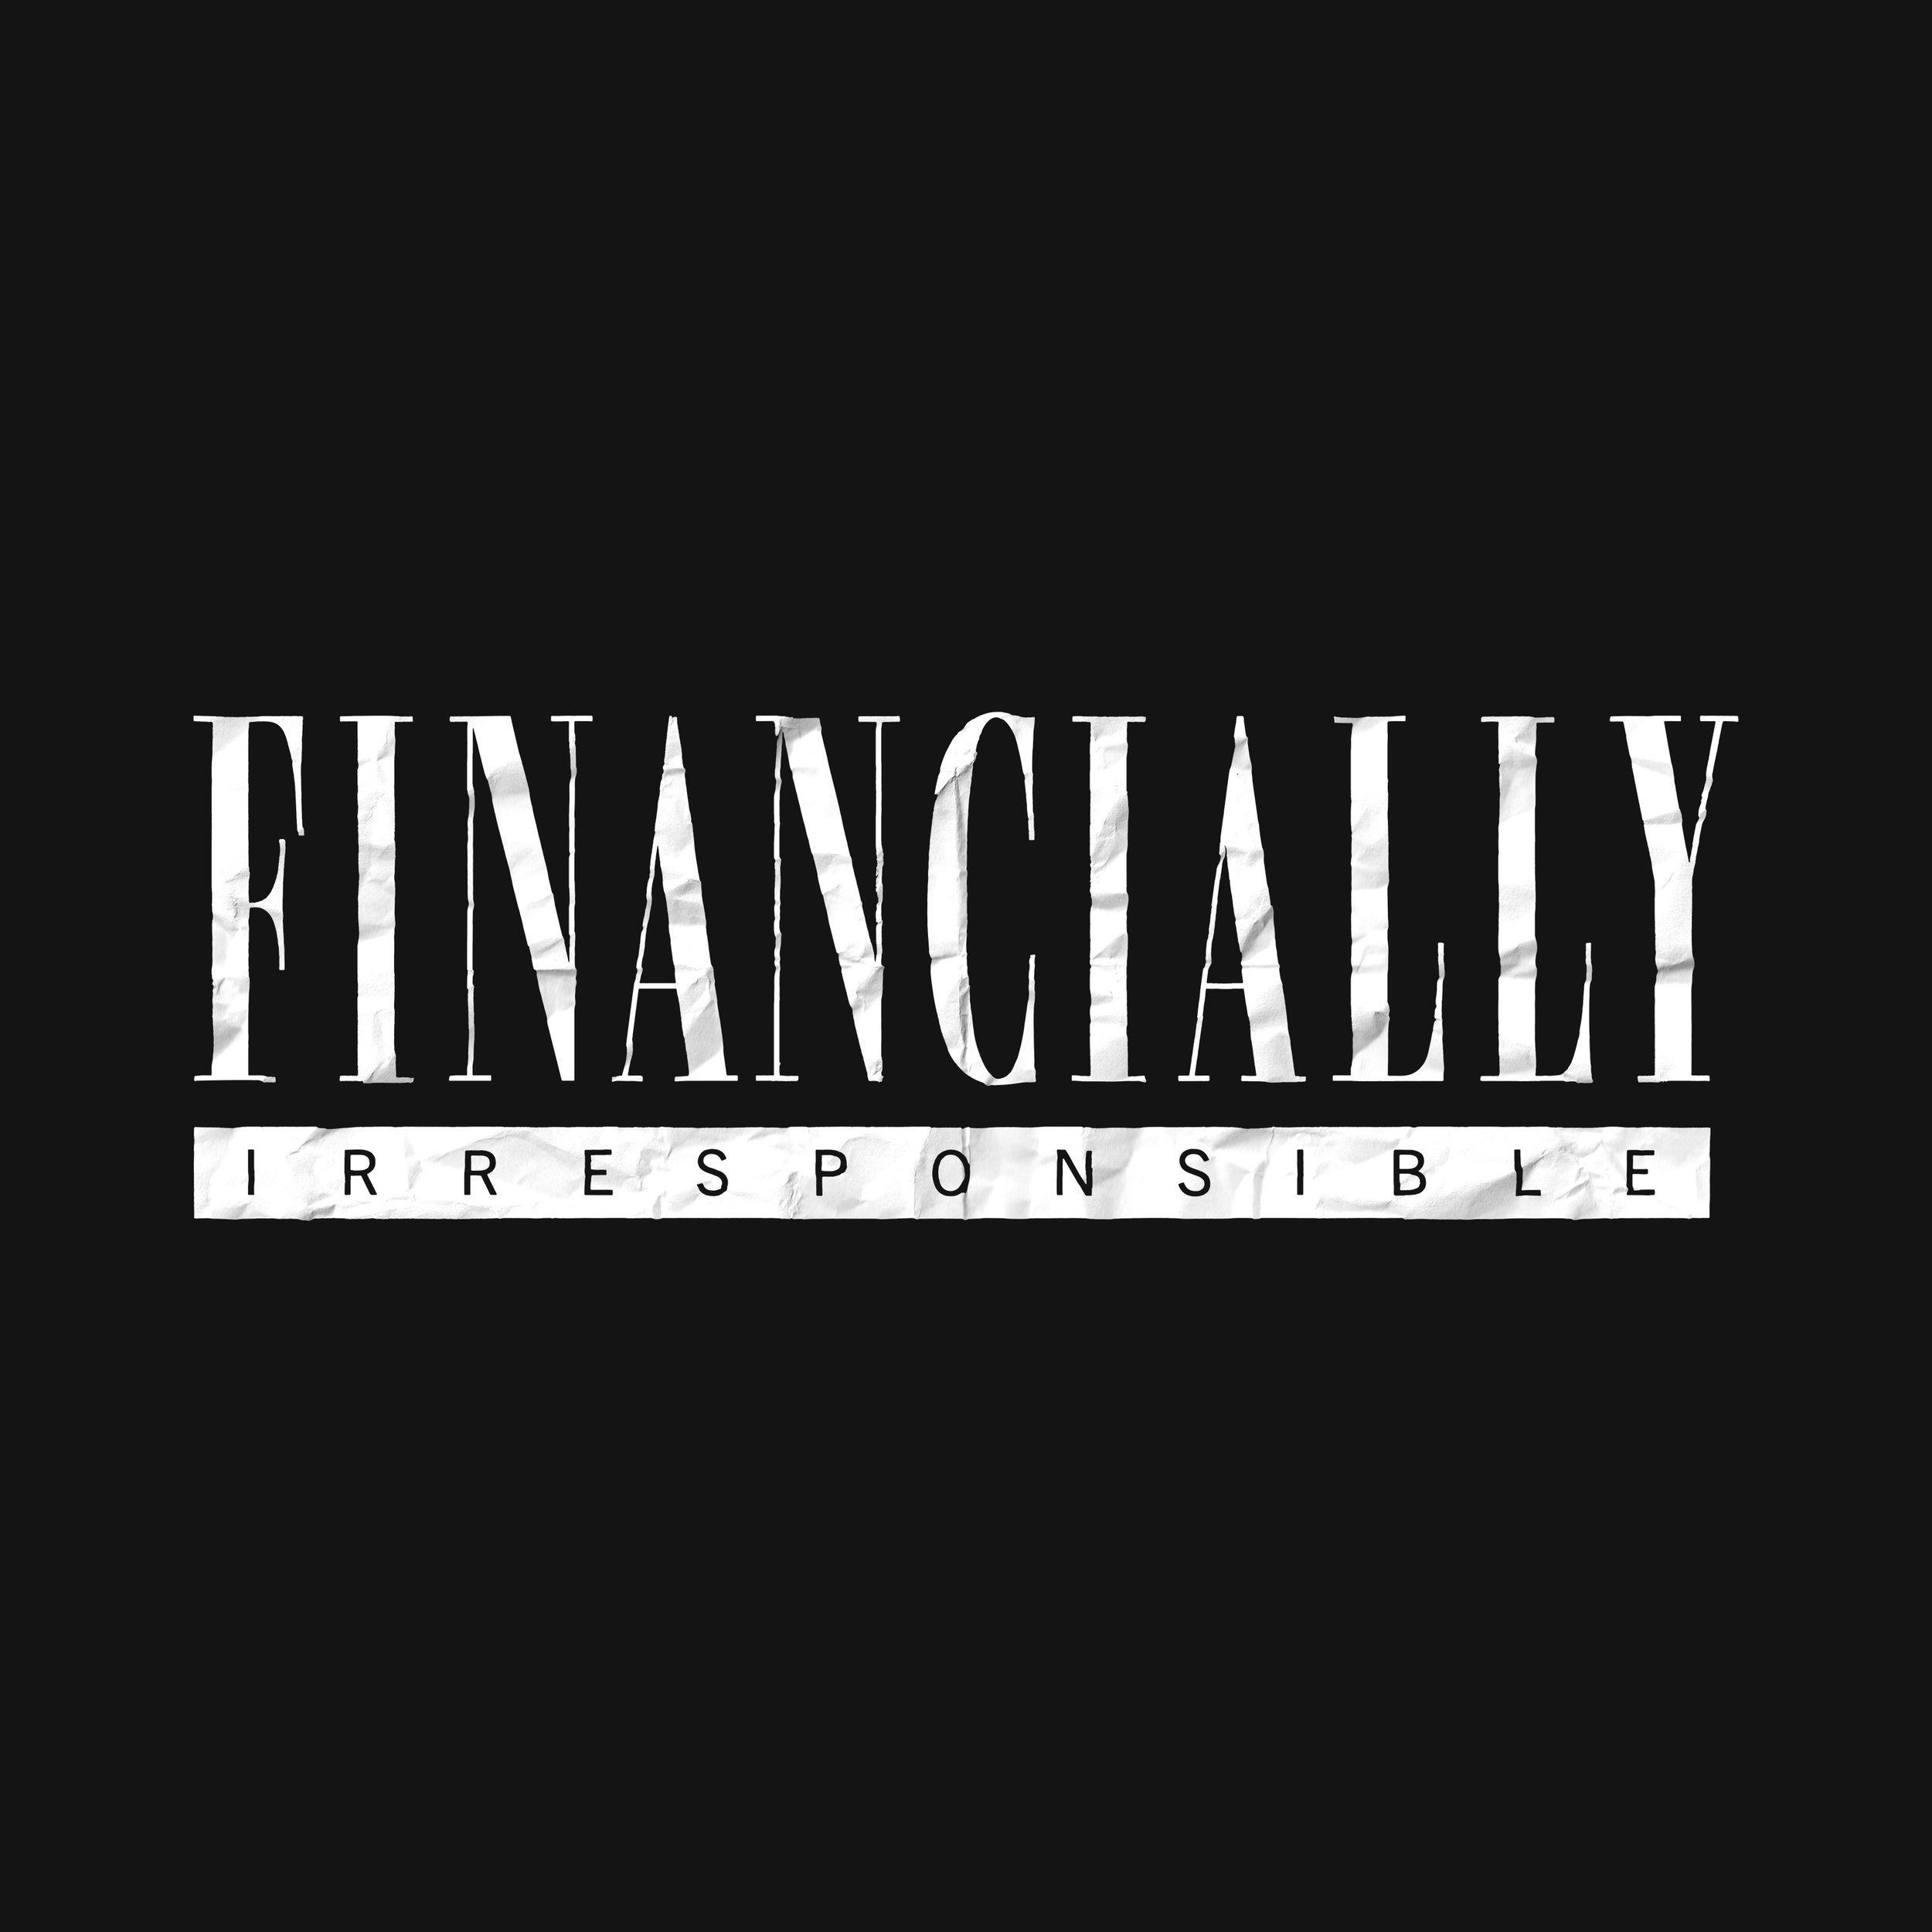 Financially Irresponsible - Wordmark LogoStreetwear Apparel CompanyLaunching 2019